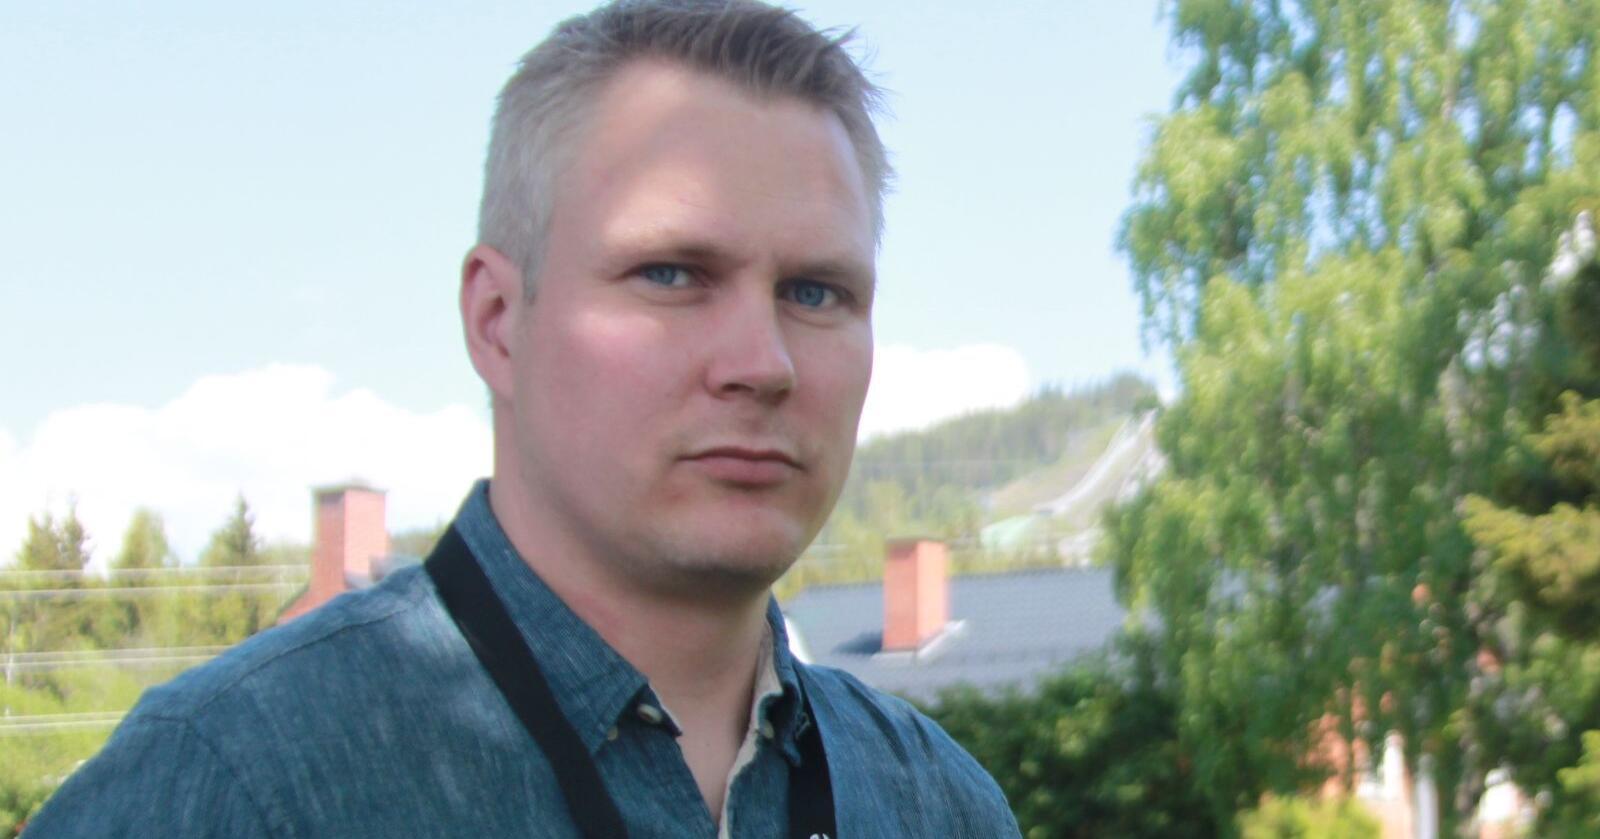 Ingvald Landet leder rovviltutvalget i Hedmark Bondelag. Foto: Svein Egil Hatlevik